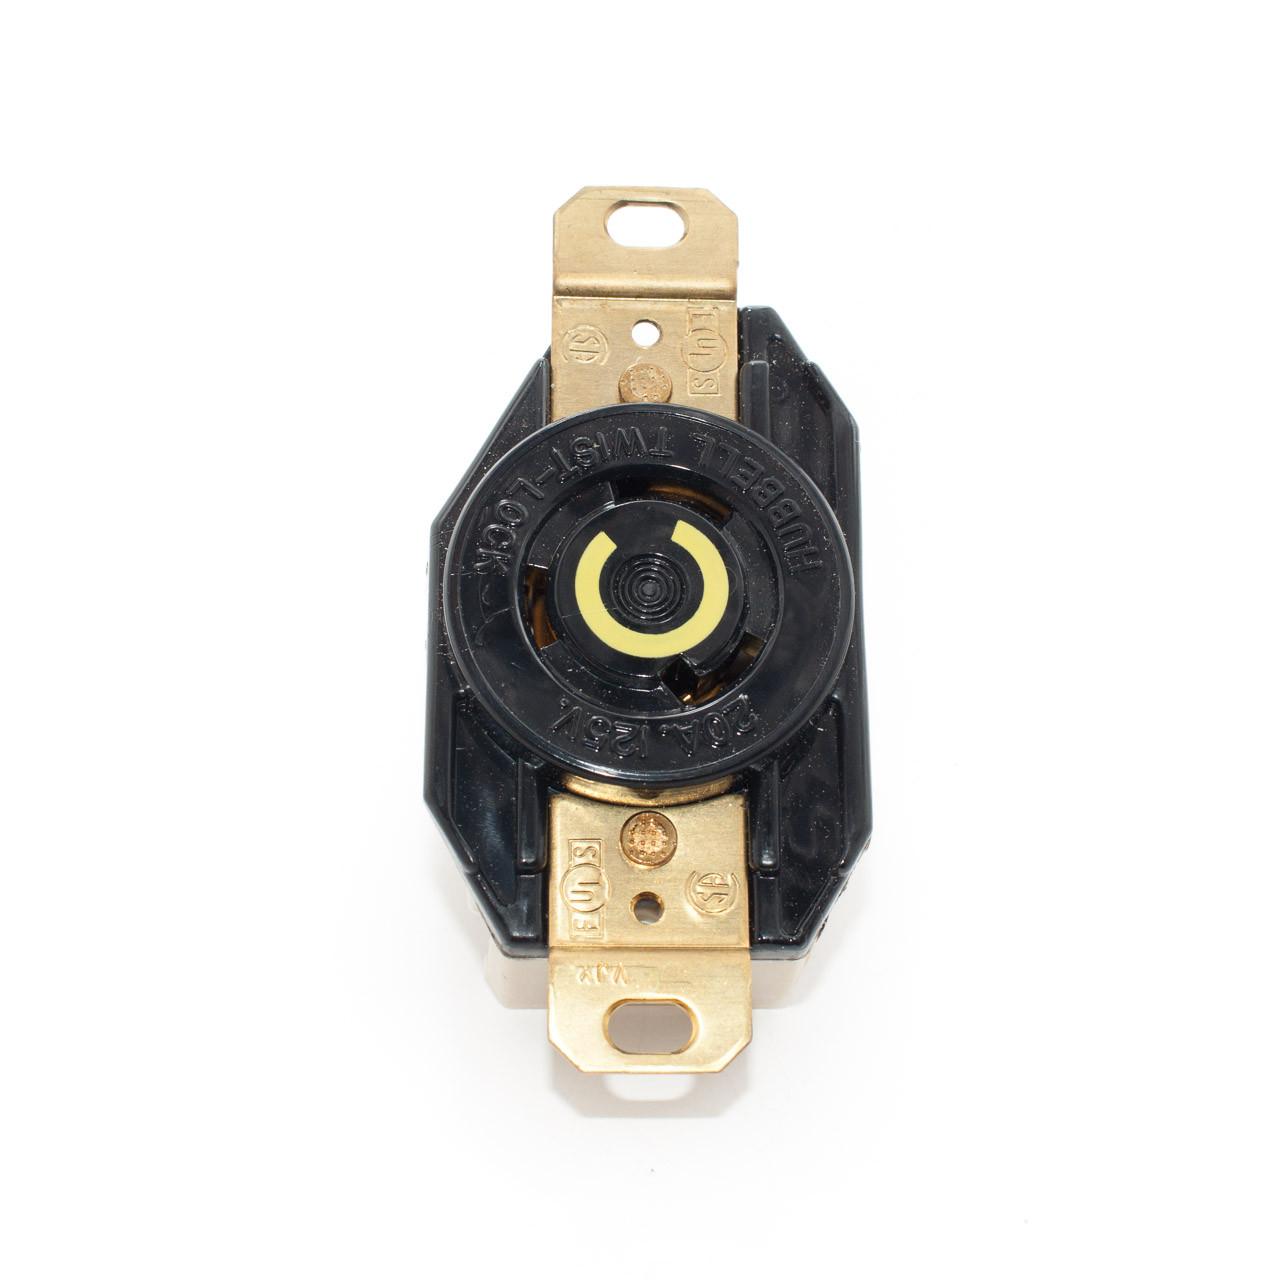 Leviton L520R Nema L5-20 20 Amp 2 Pole 3 Wire 125V Single Locking Receptacle